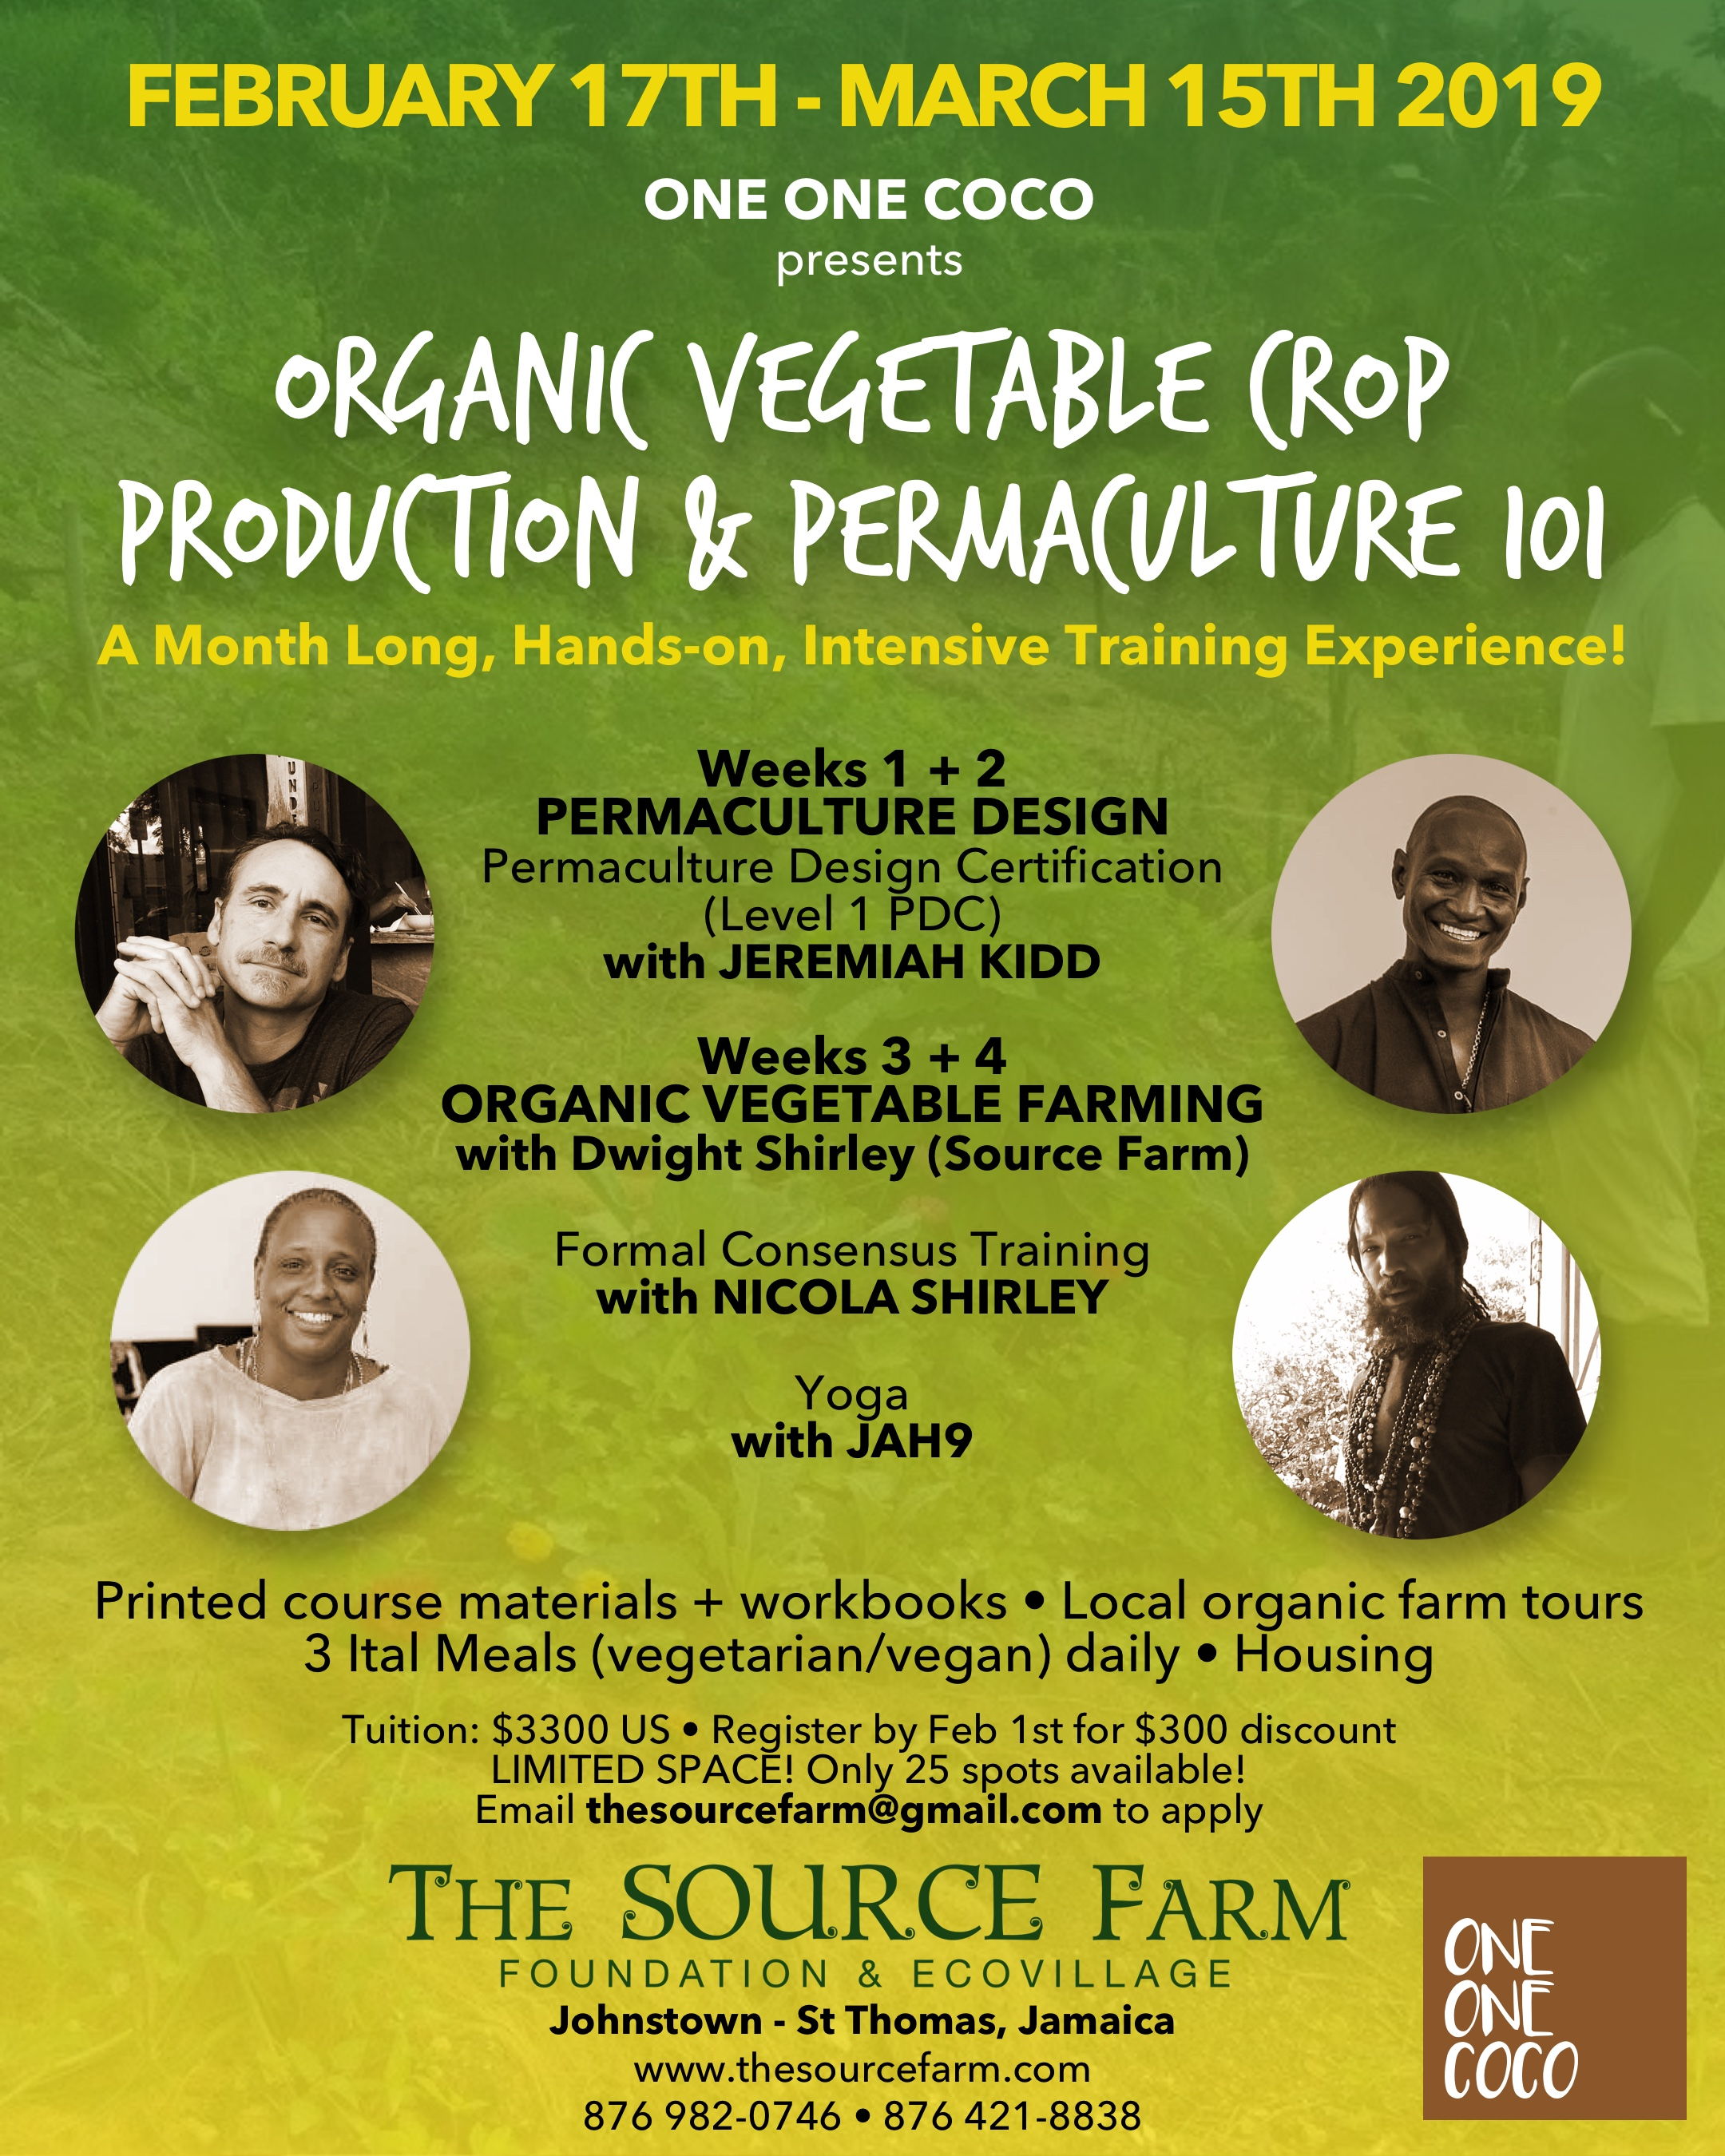 organic-vegetable-crops-permaculture-101-v6.jpg